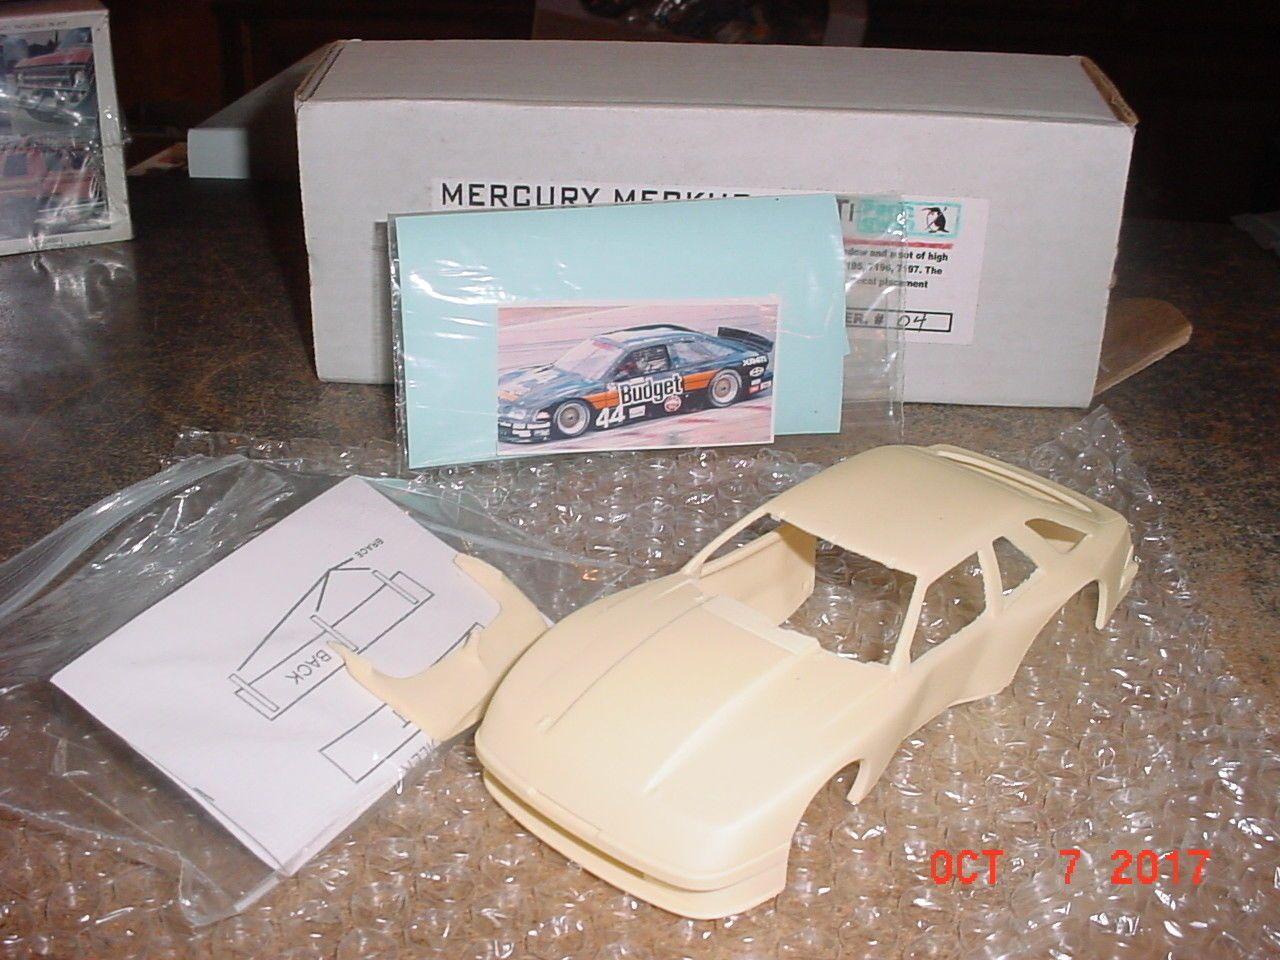 Mercury Merkur Xr4ti Imsa Racer Body 1 24th Penn Gwen 5005 44